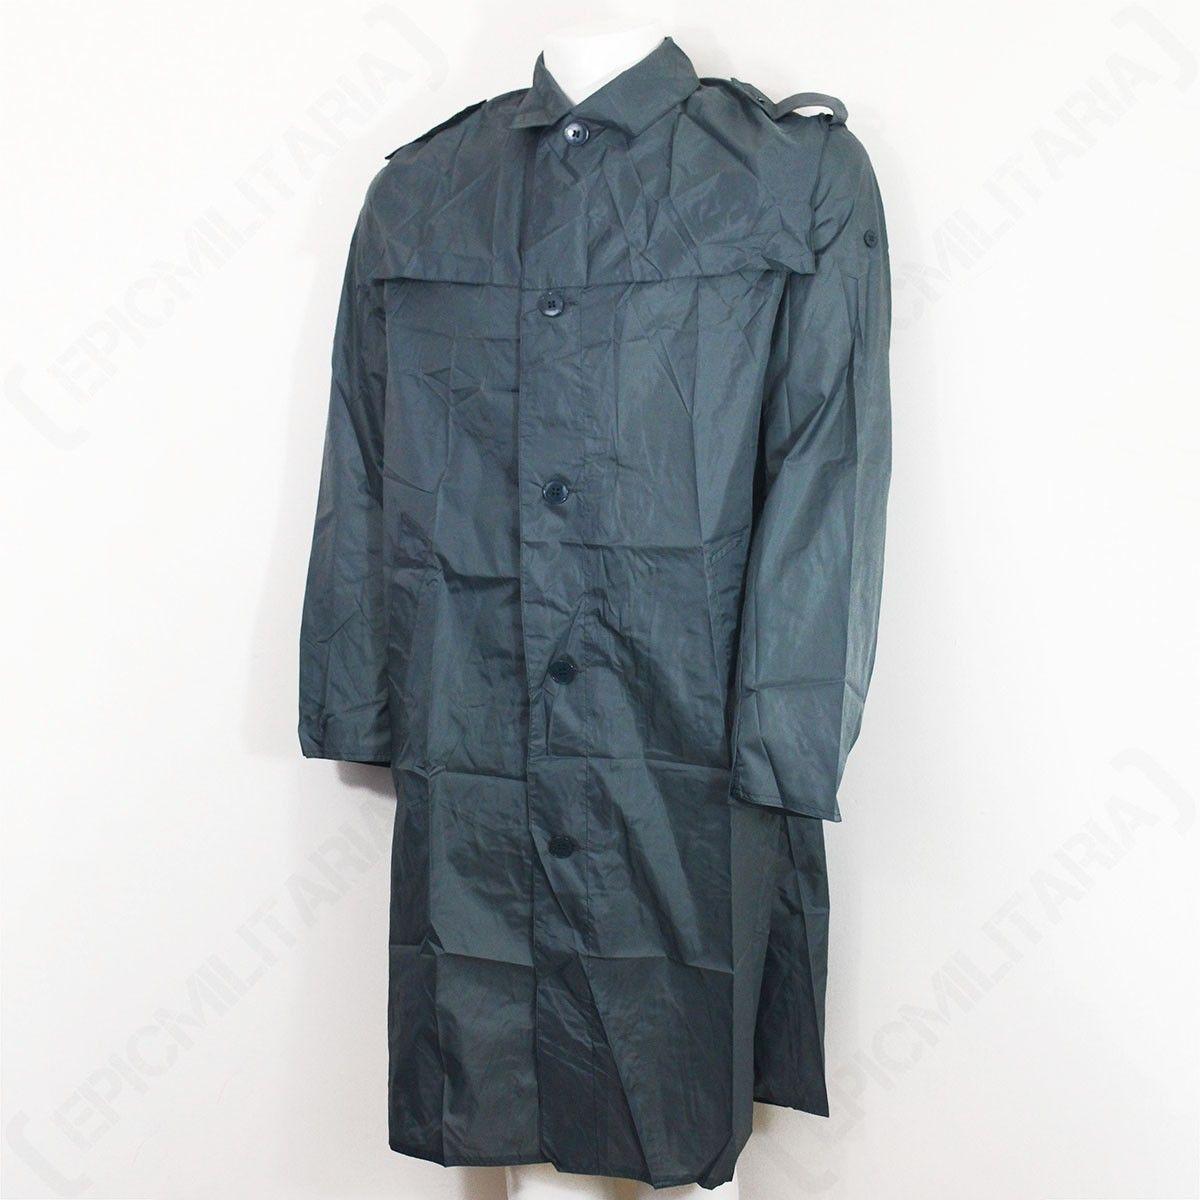 6b804856f Original Swiss Grey Raincoat - Front   Army Surplus Jackets and ...